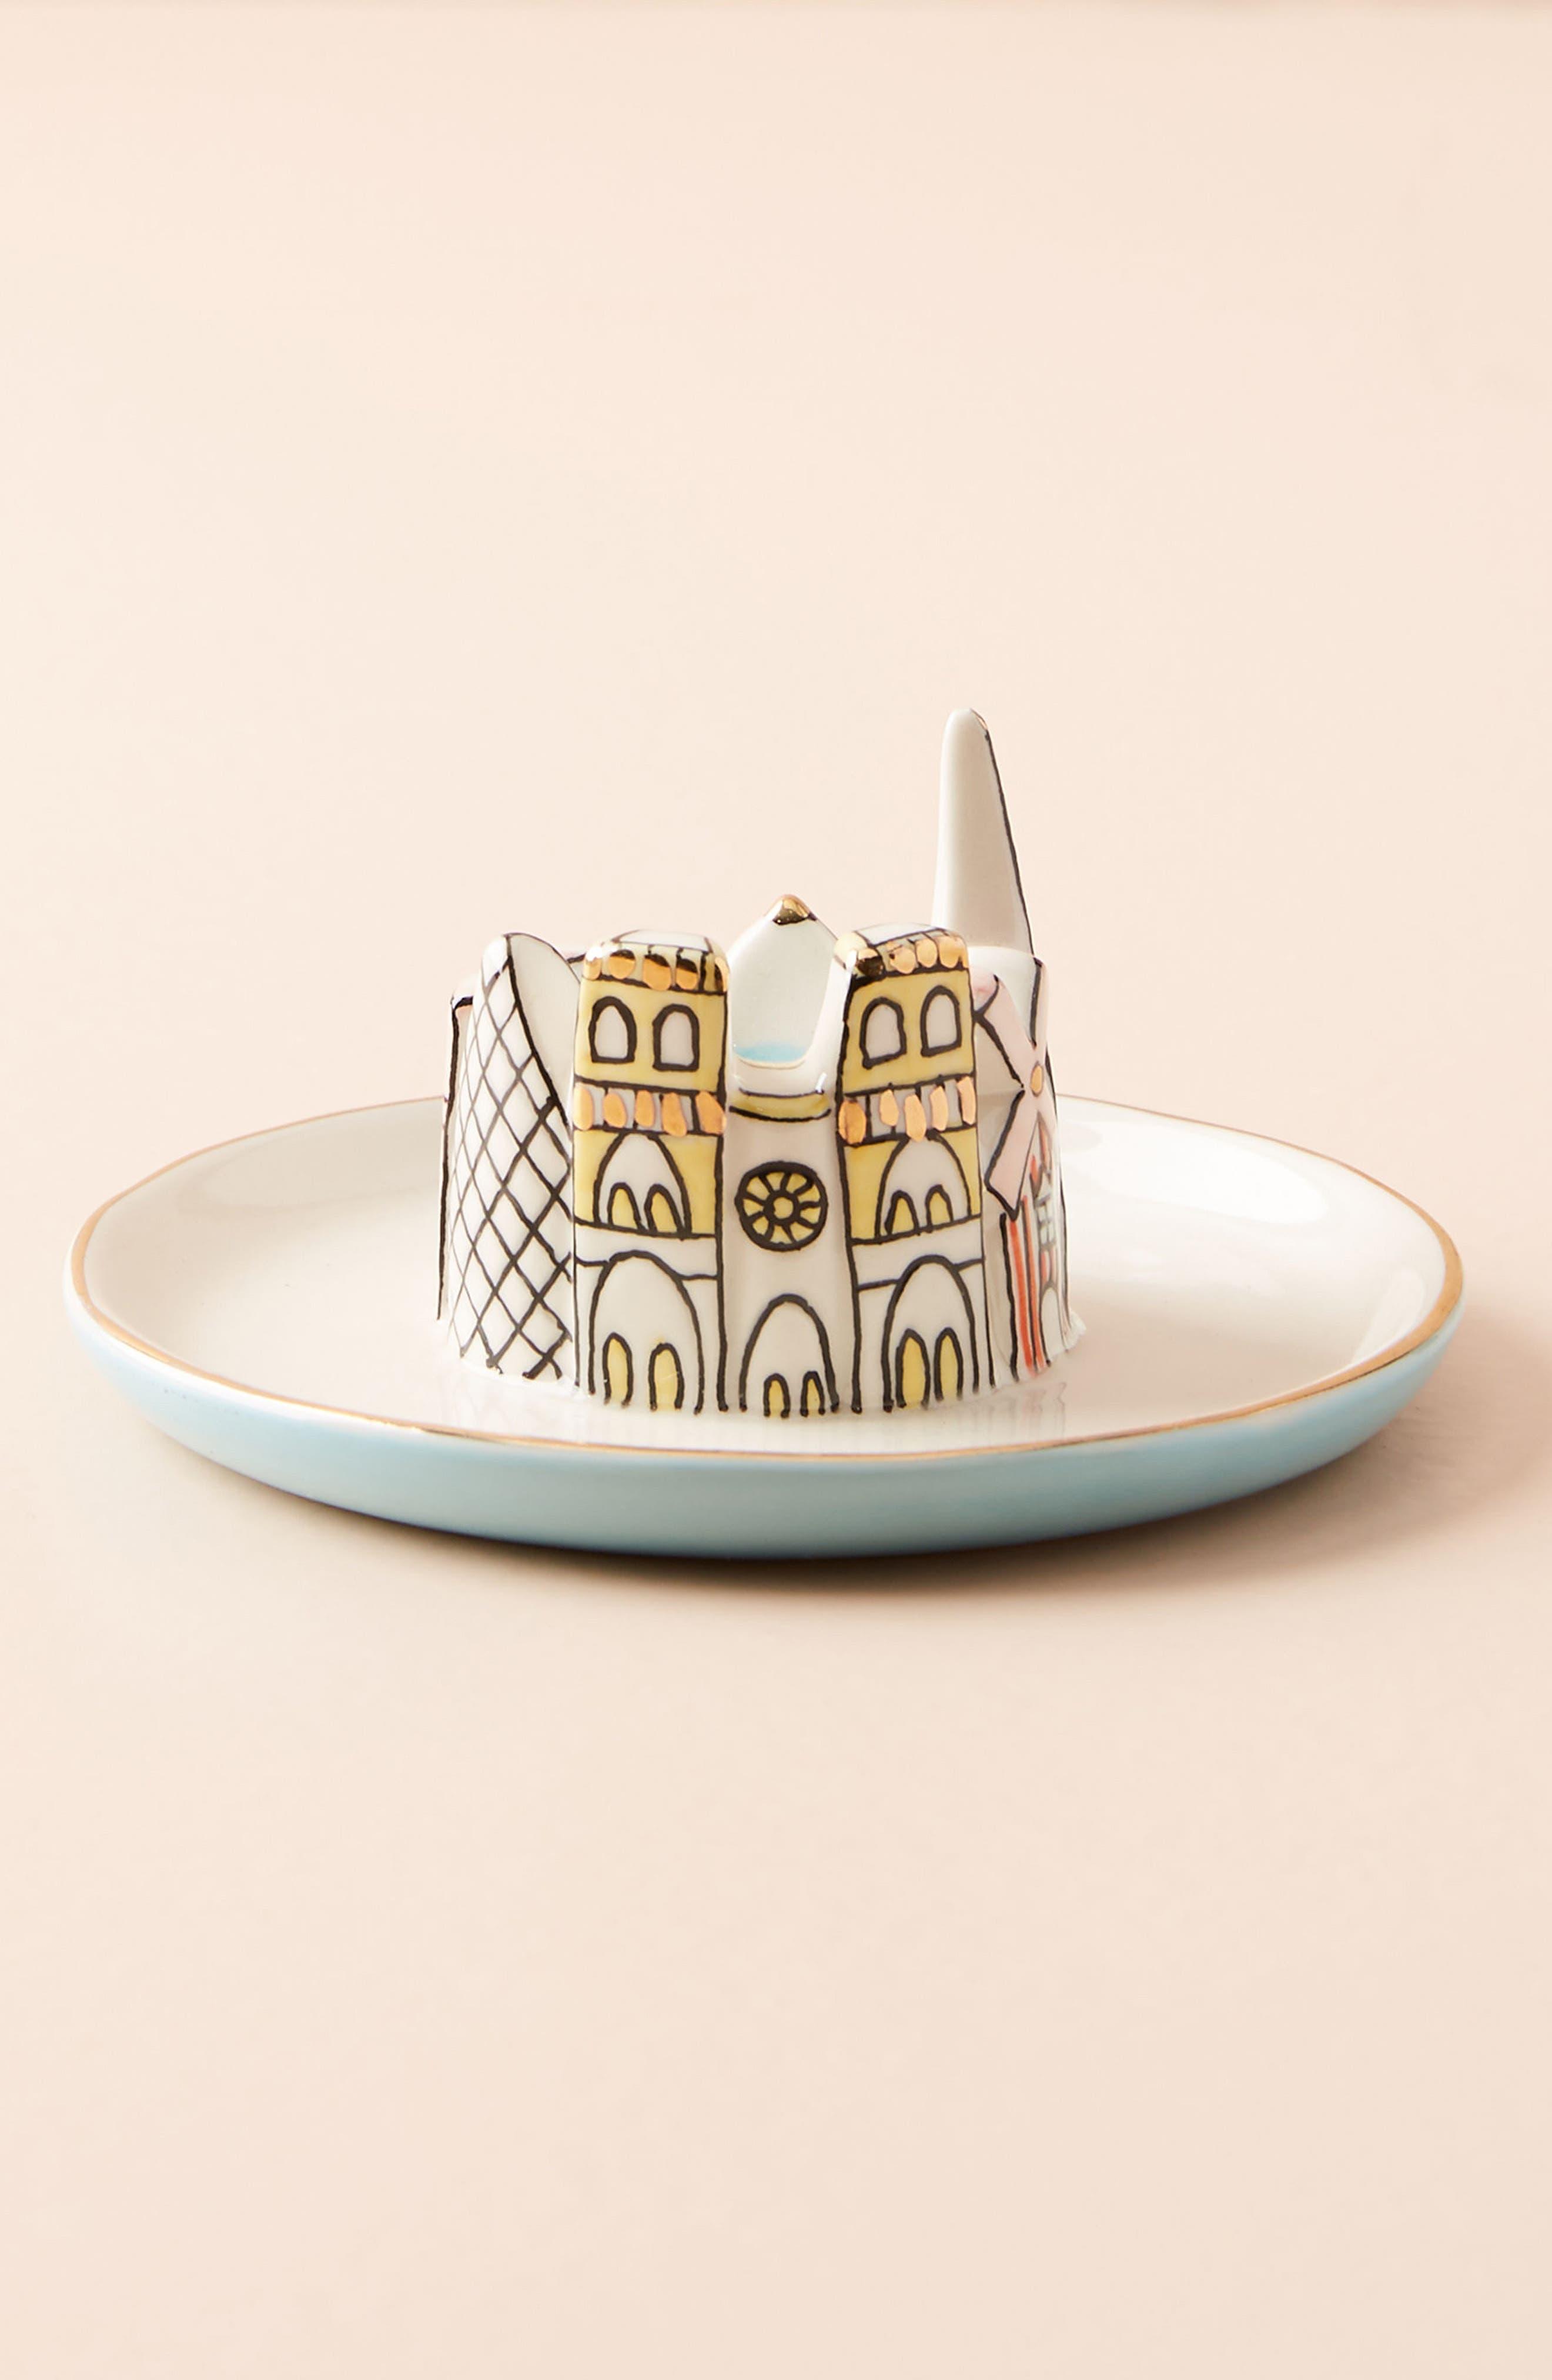 City Trinket Dish,                             Main thumbnail 1, color,                             400